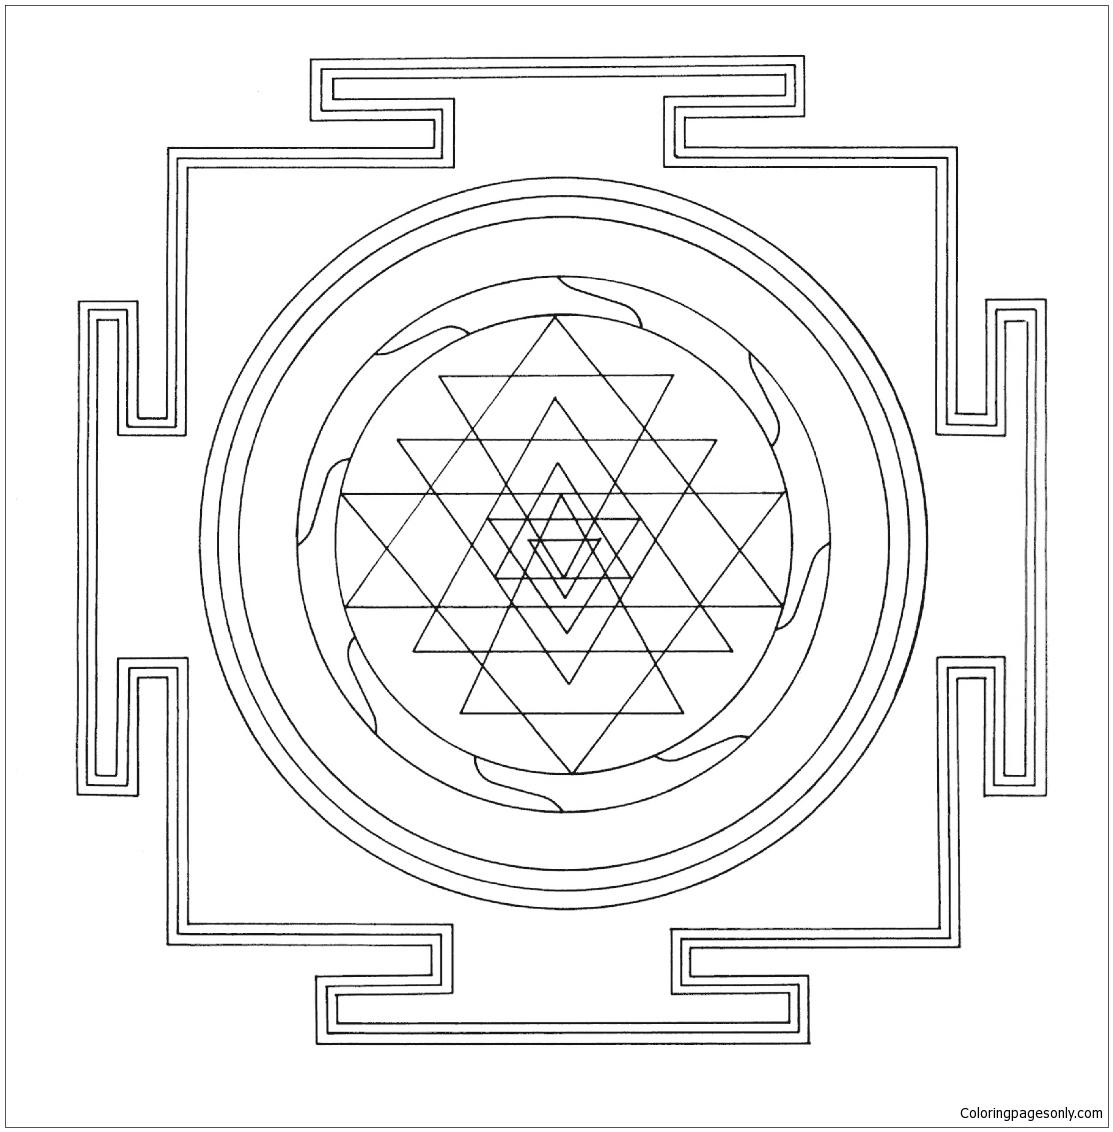 Tibetan Sri Yantra Mandala Coloring Page - Free Coloring